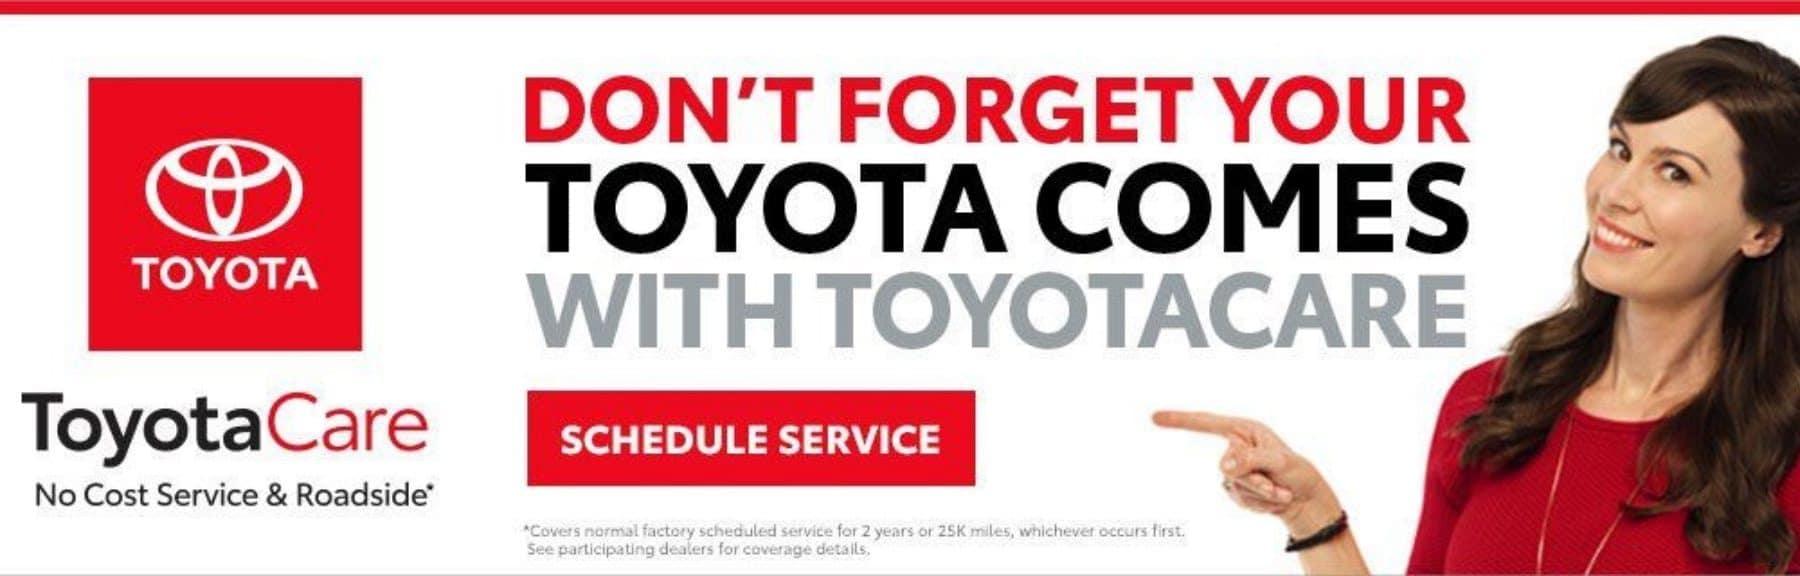 Toyotacare